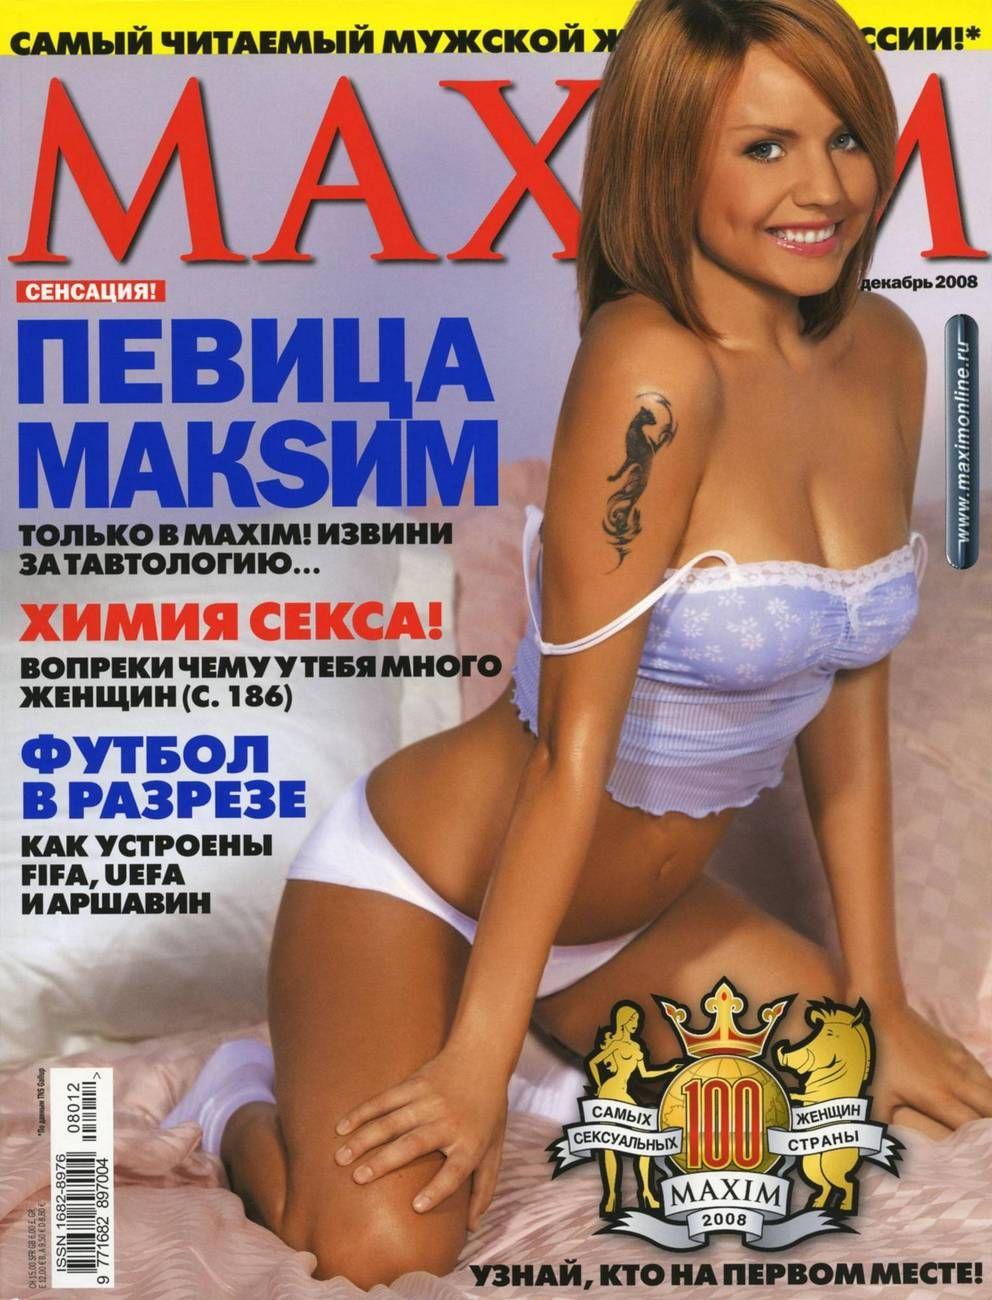 Обнаженная Певица Максим